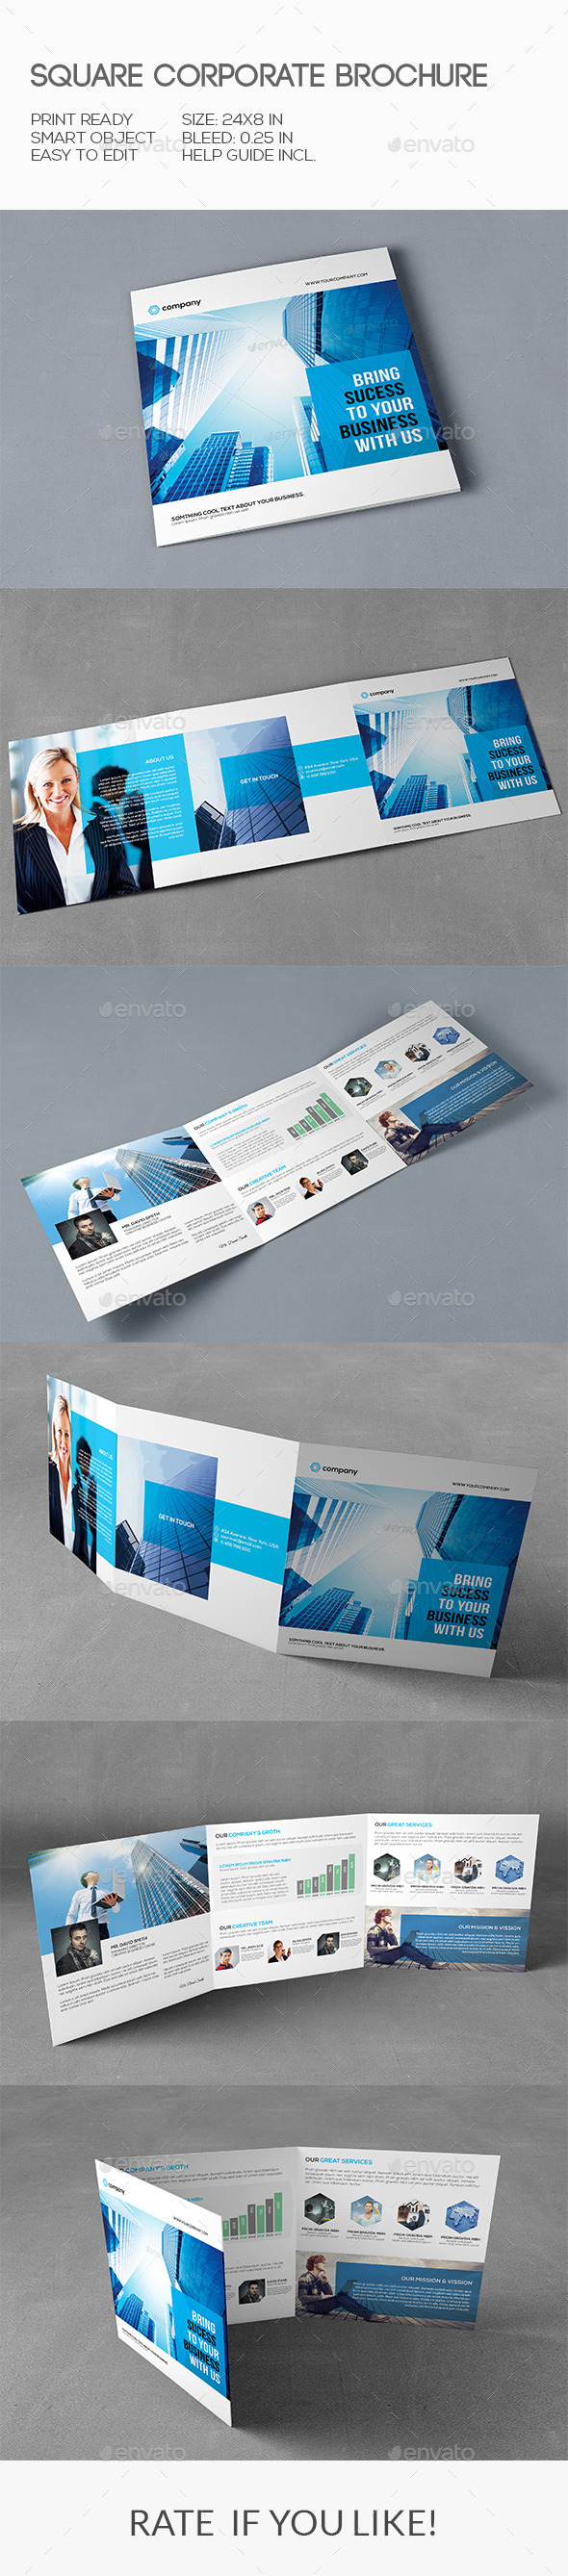 Square Corporate Brochure - Corporate Brochures